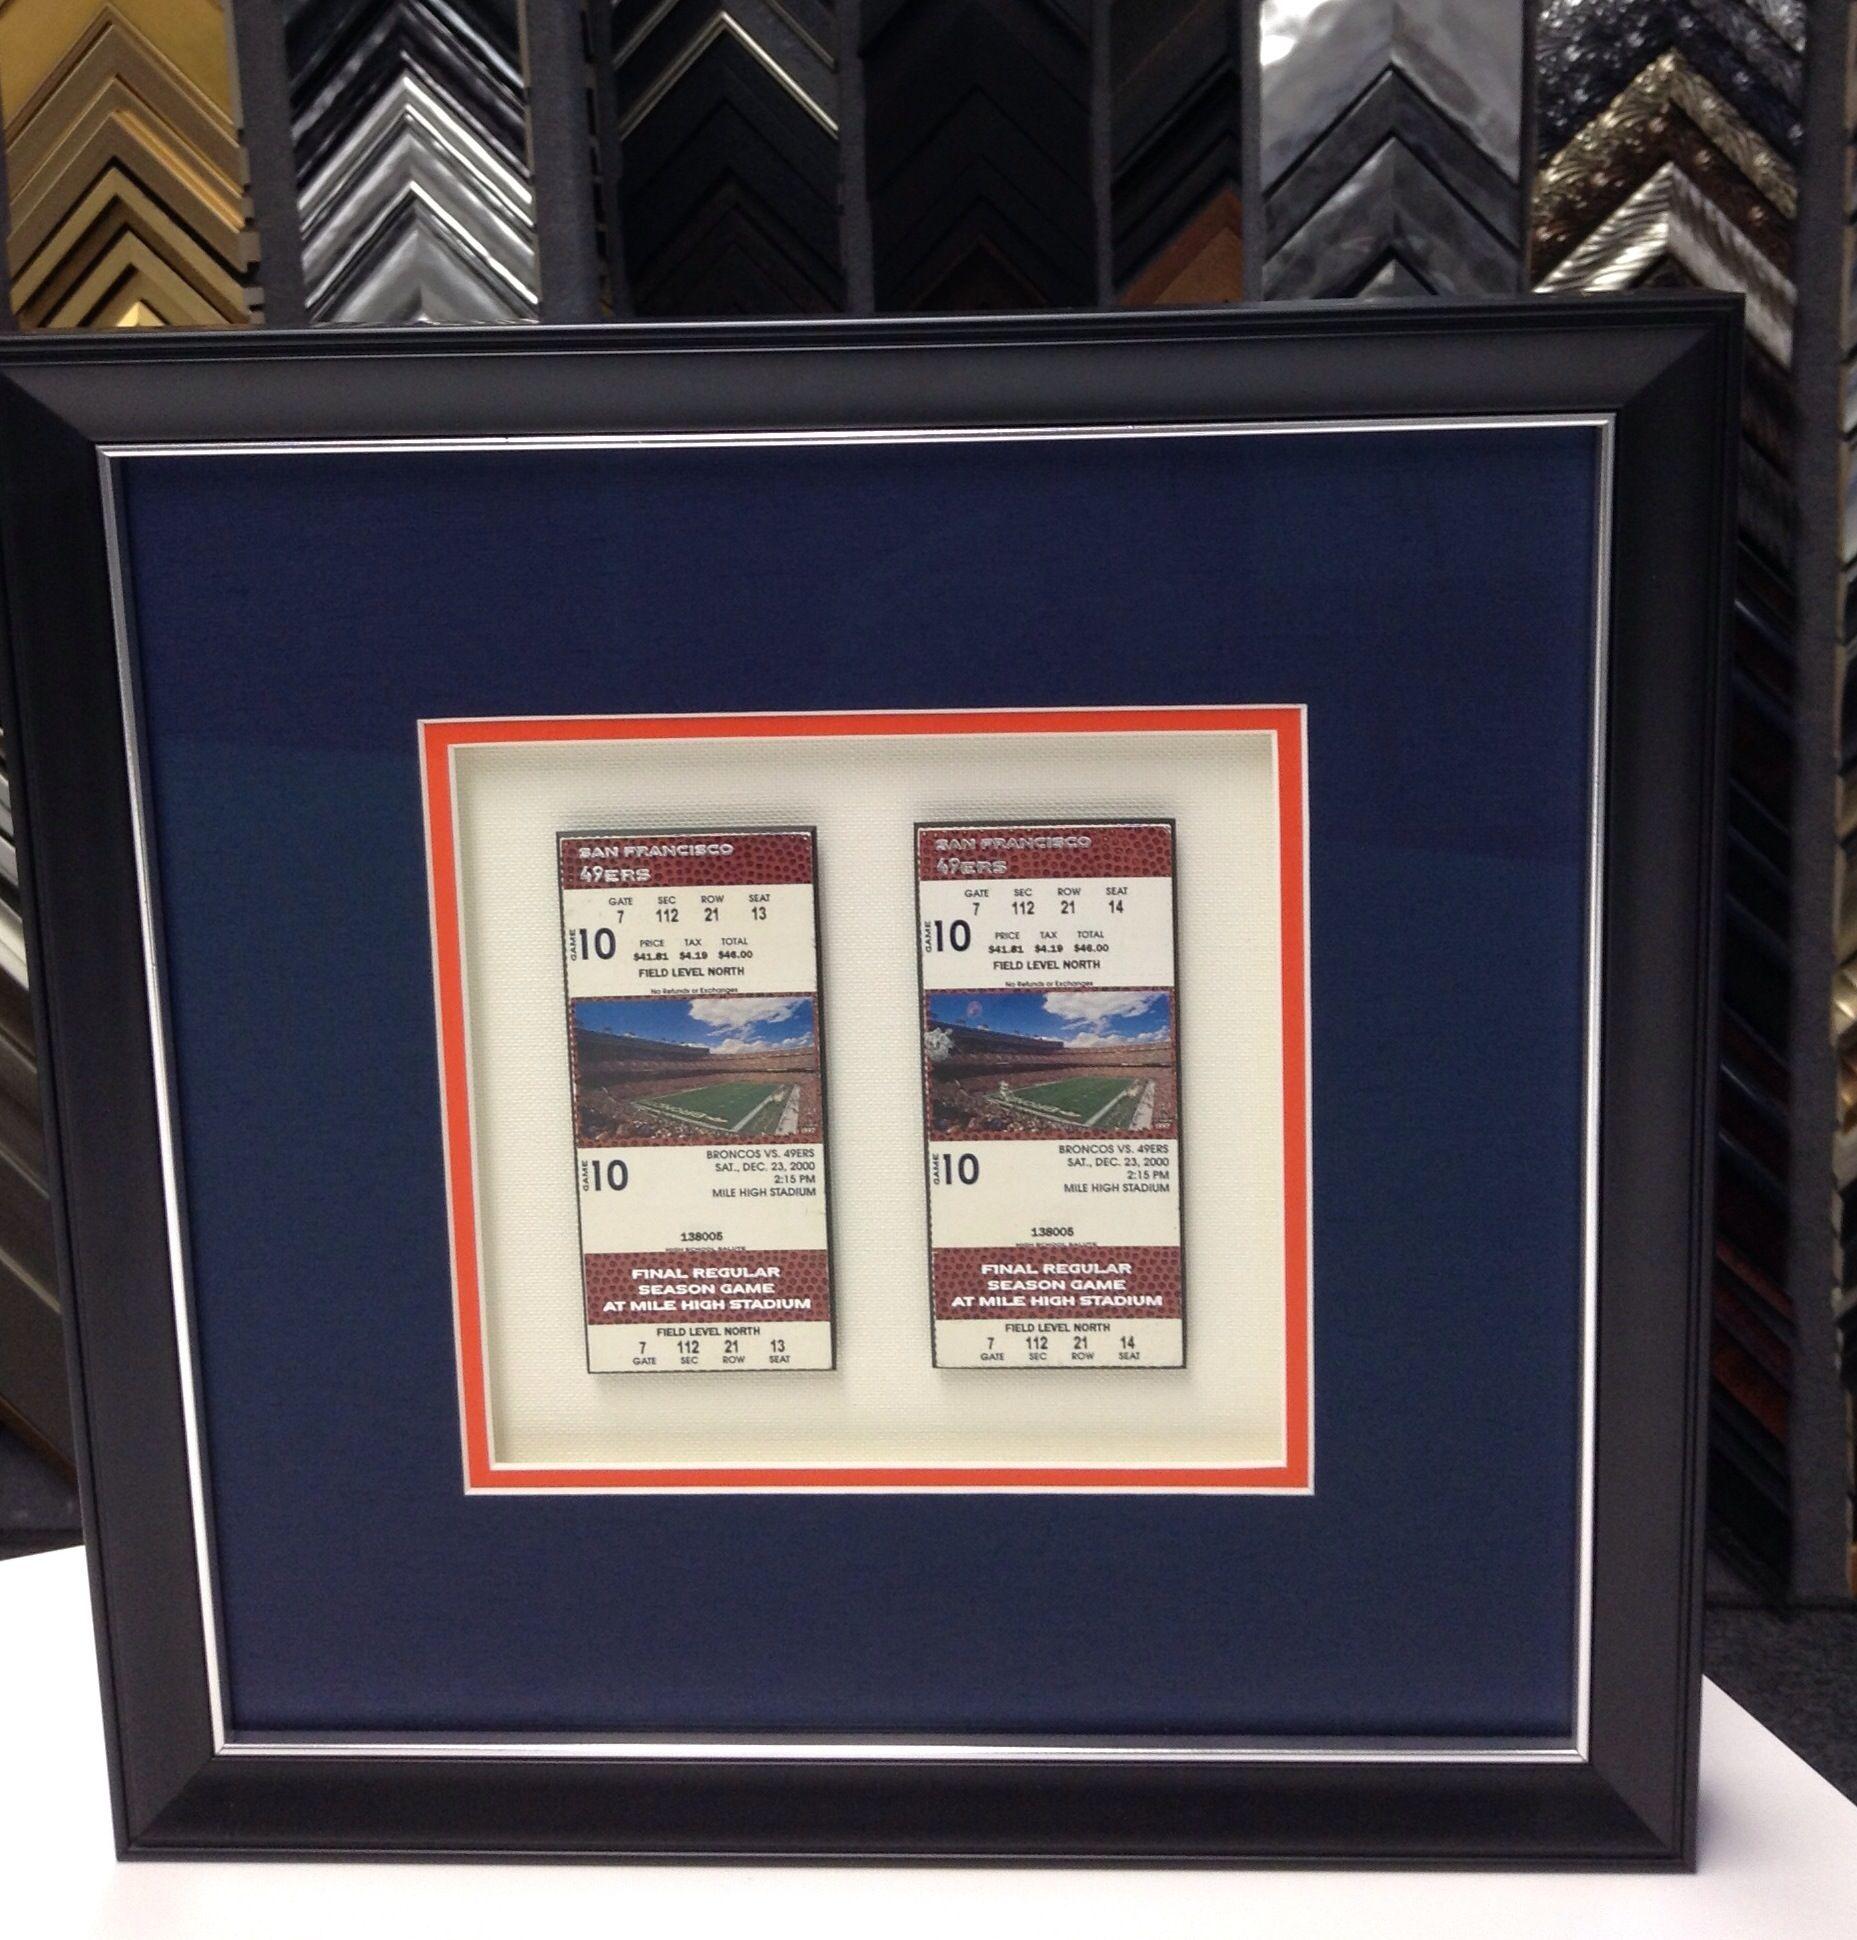 Custom Picture Frame | Sports Memorabilia | Design by Karens Detail ...